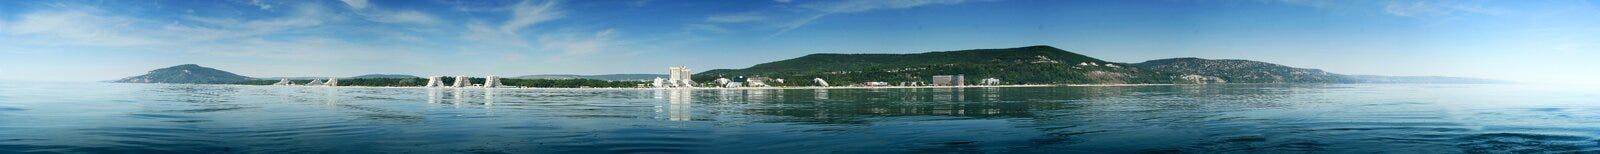 Panorama black sea resort landscape Stock Image